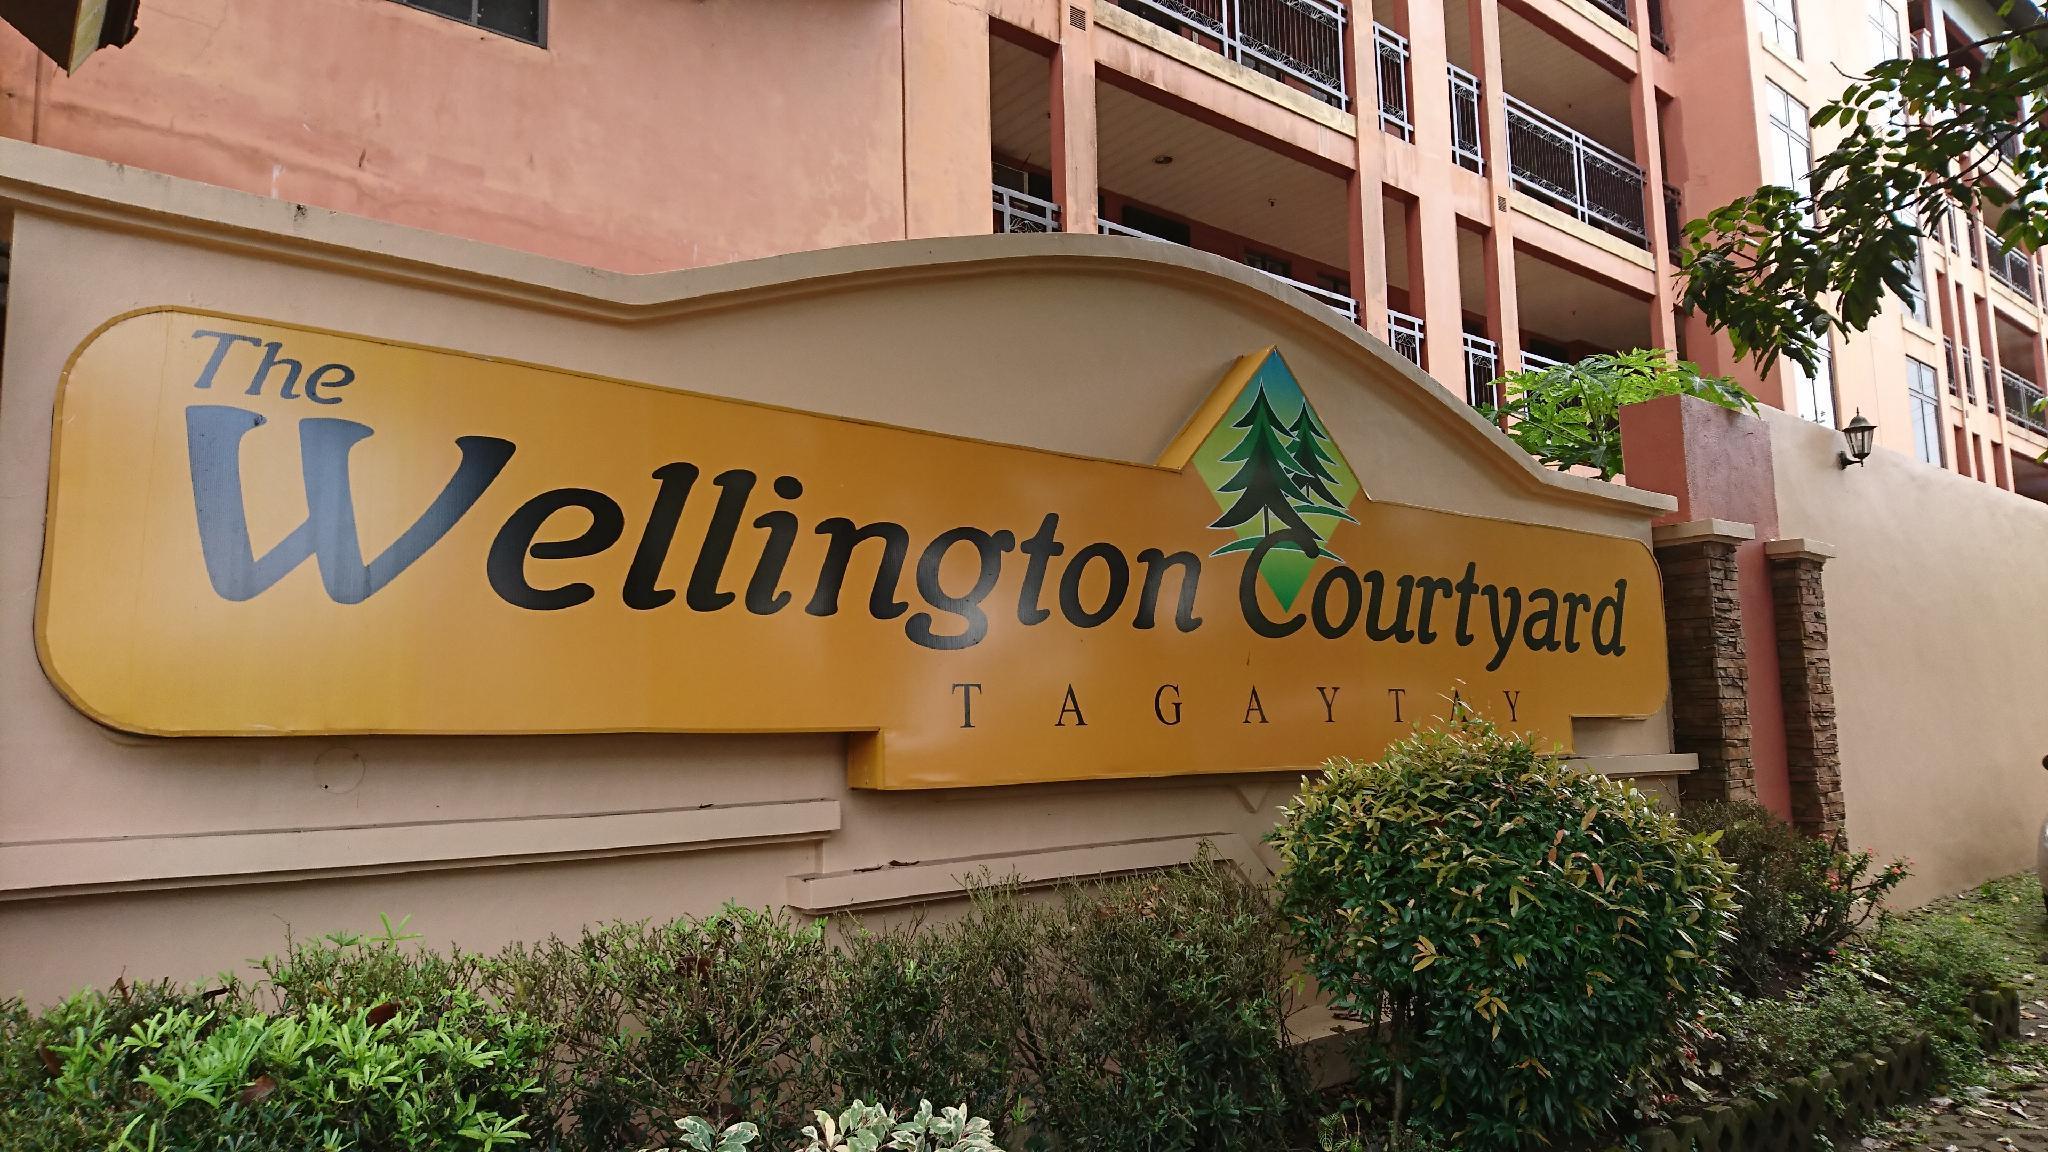 Wellington Courtyard Tagaytay   2BR   6 adults MAX